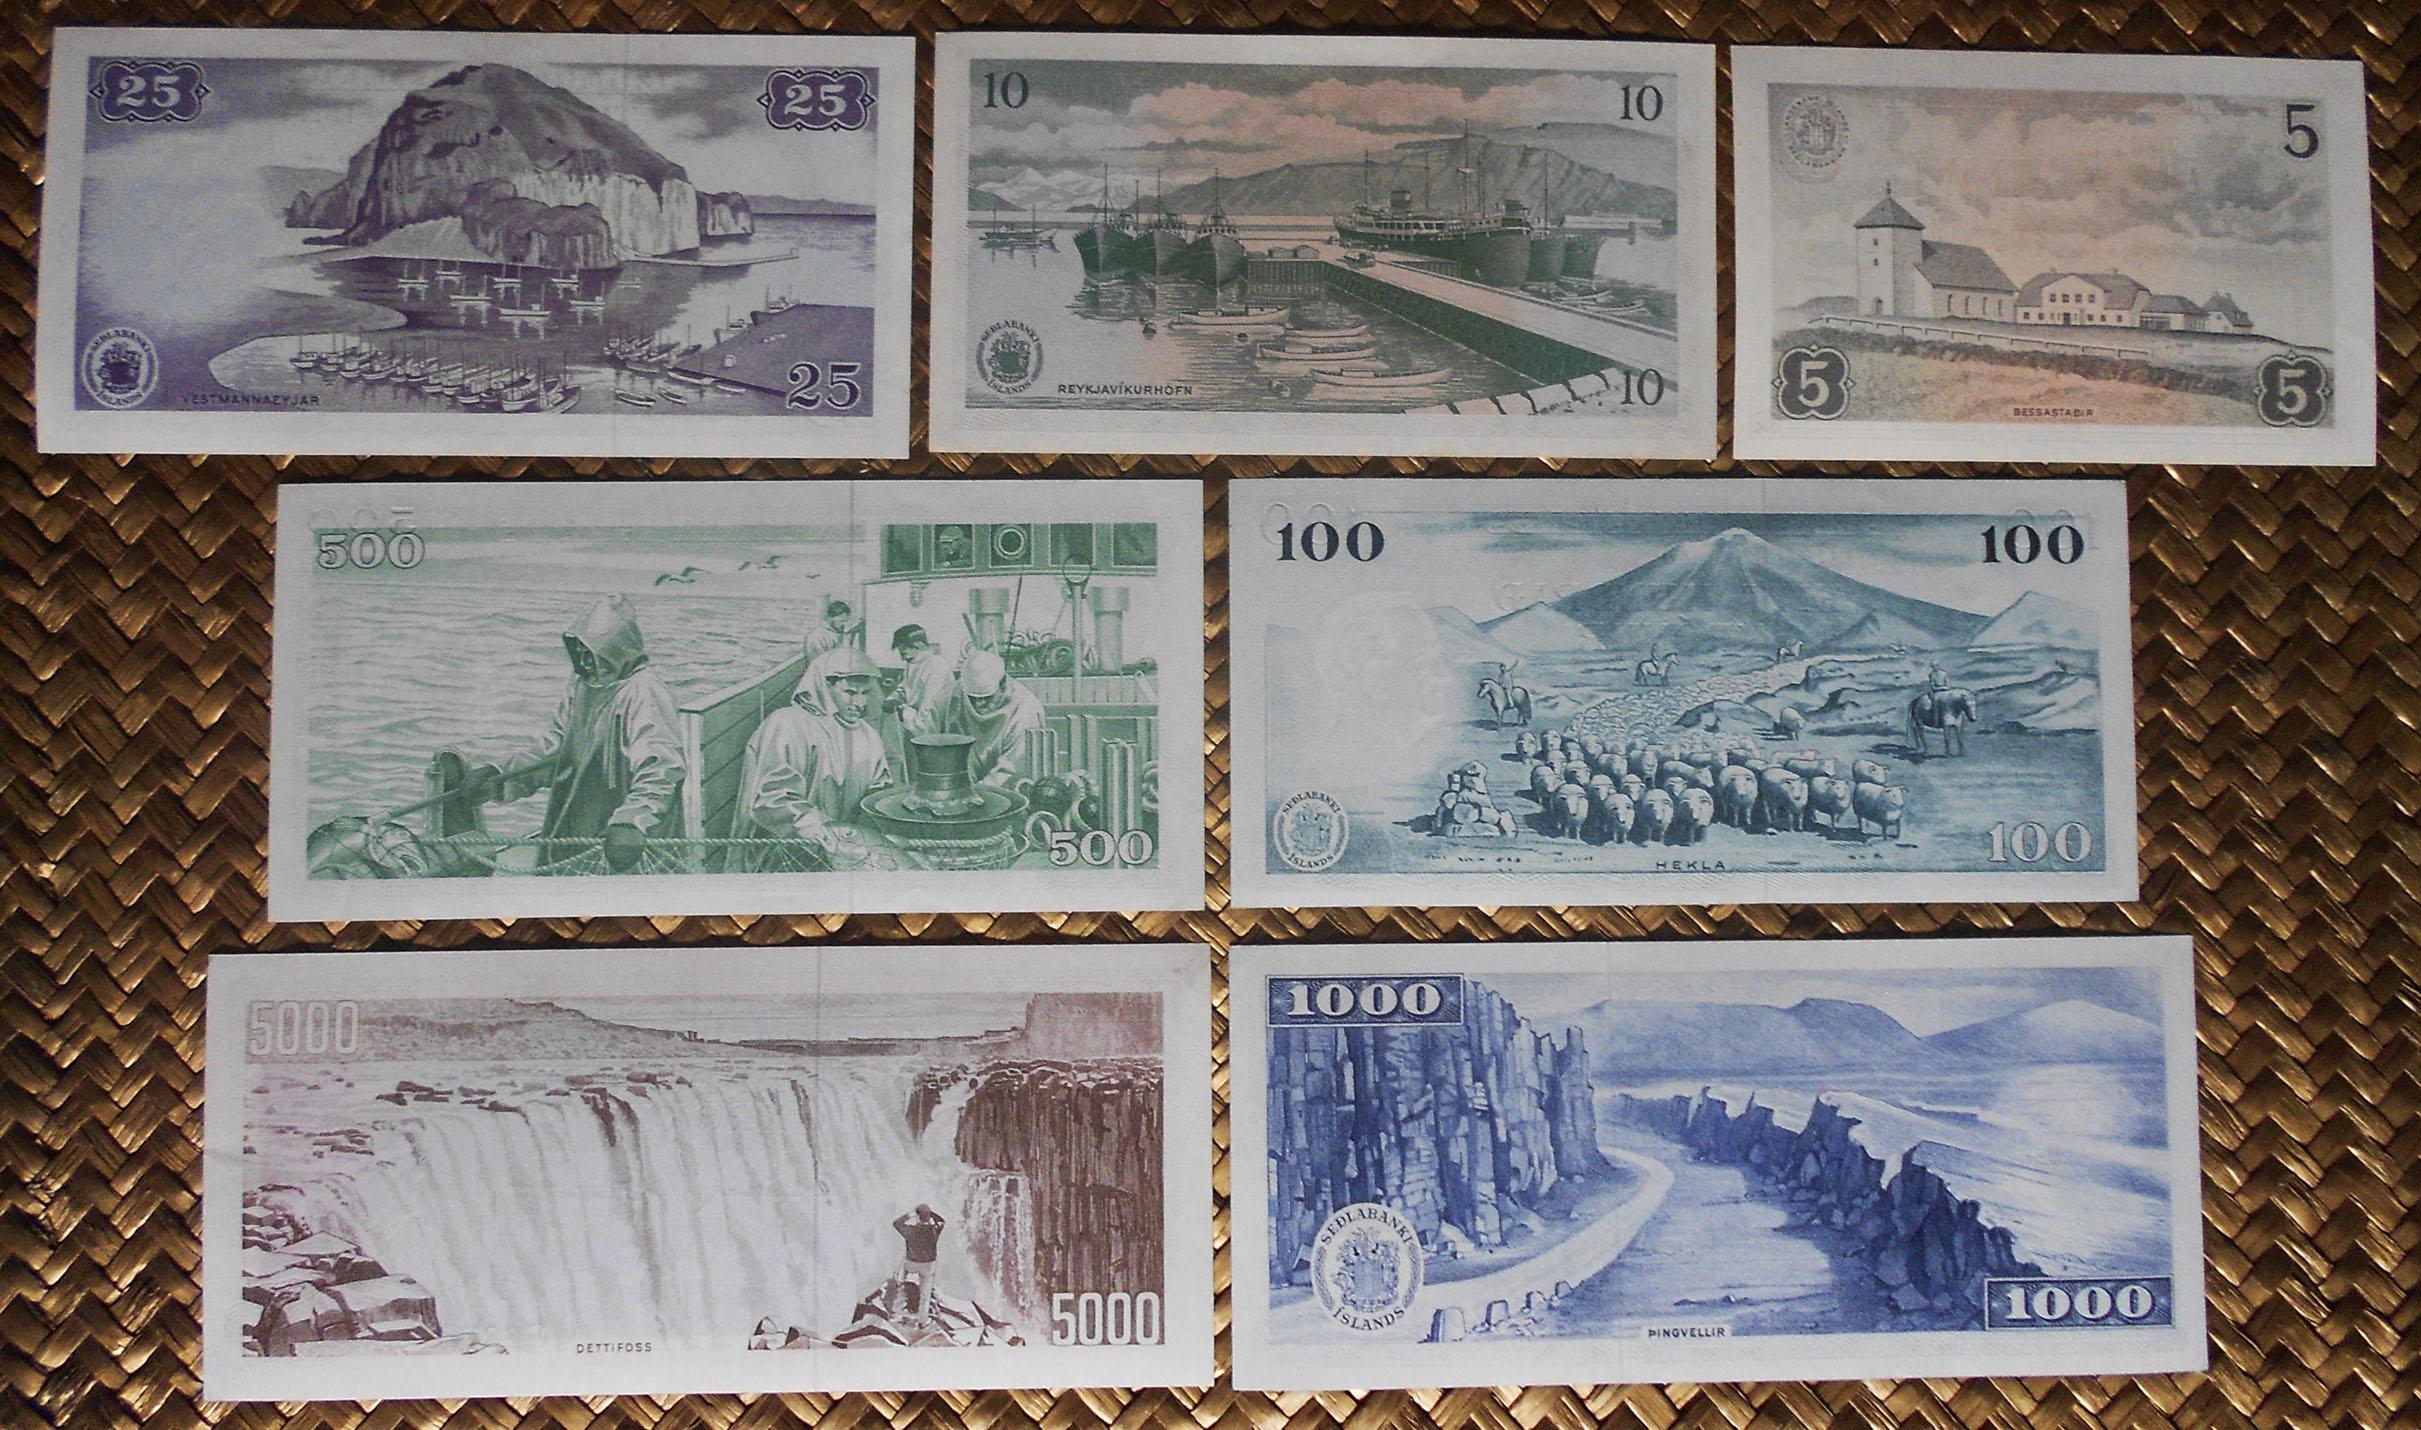 Islandia Seôlabanki Islands serie coronas 1961 reversos